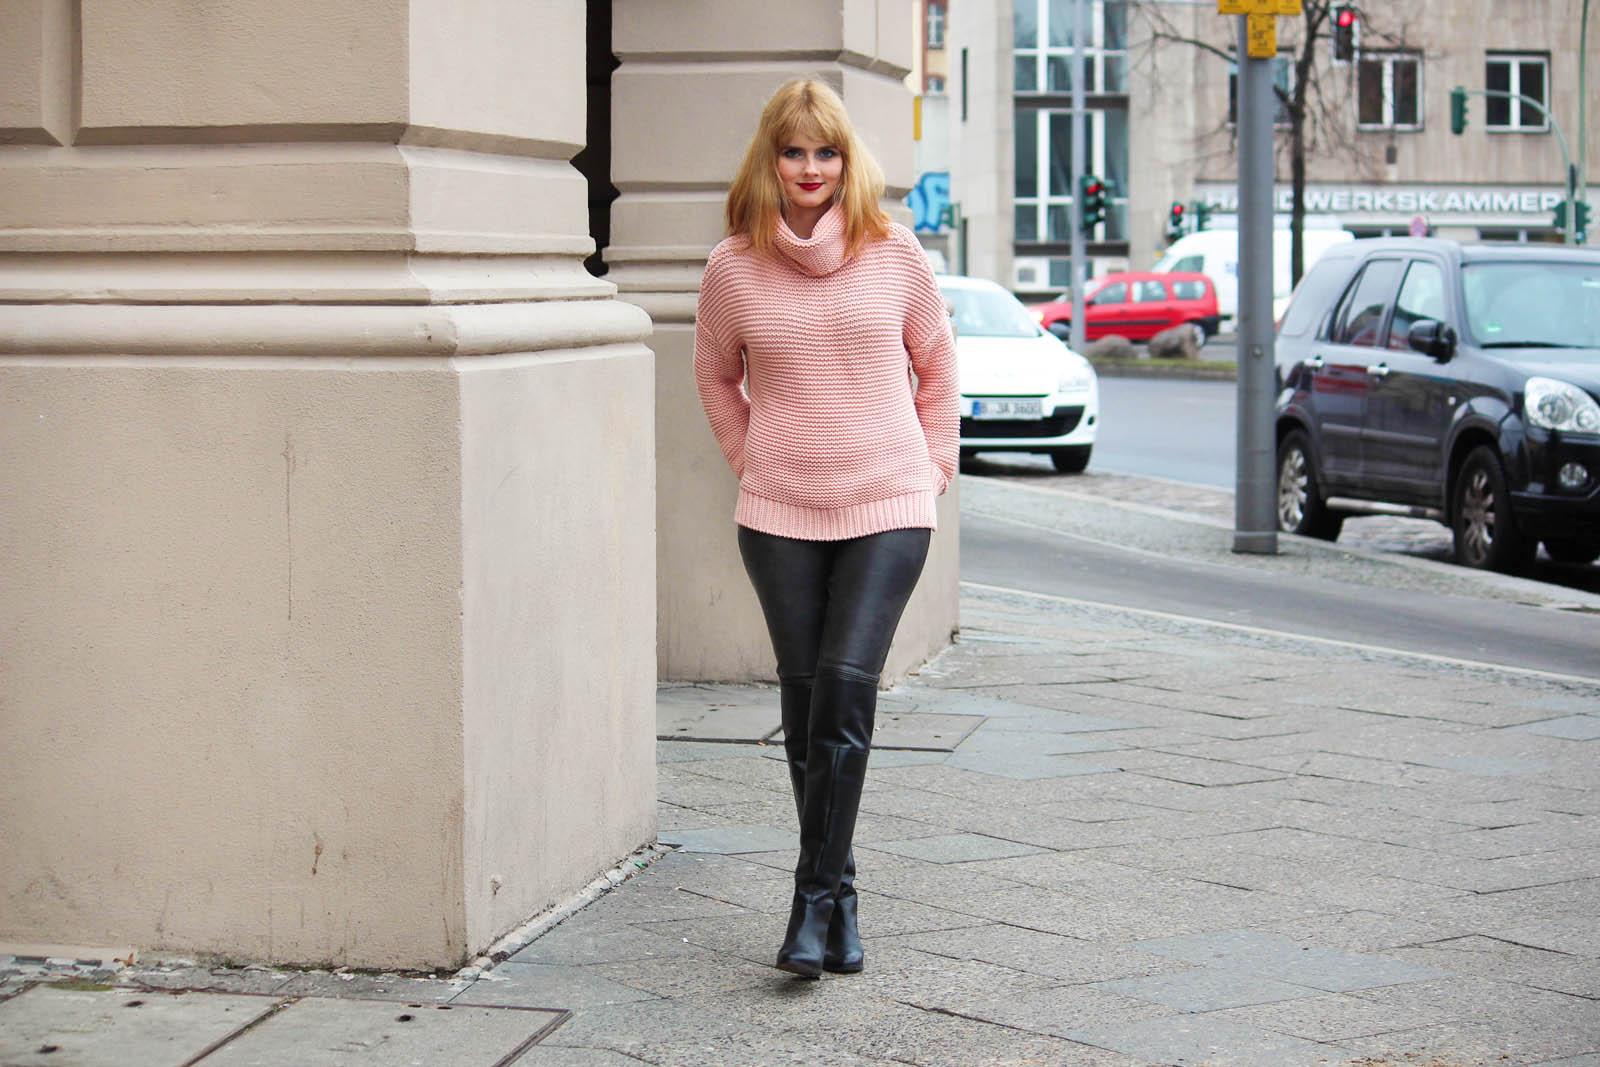 Belles Choses overknee City Style � OutfitBerlin BootsDes 3Rj4AL5